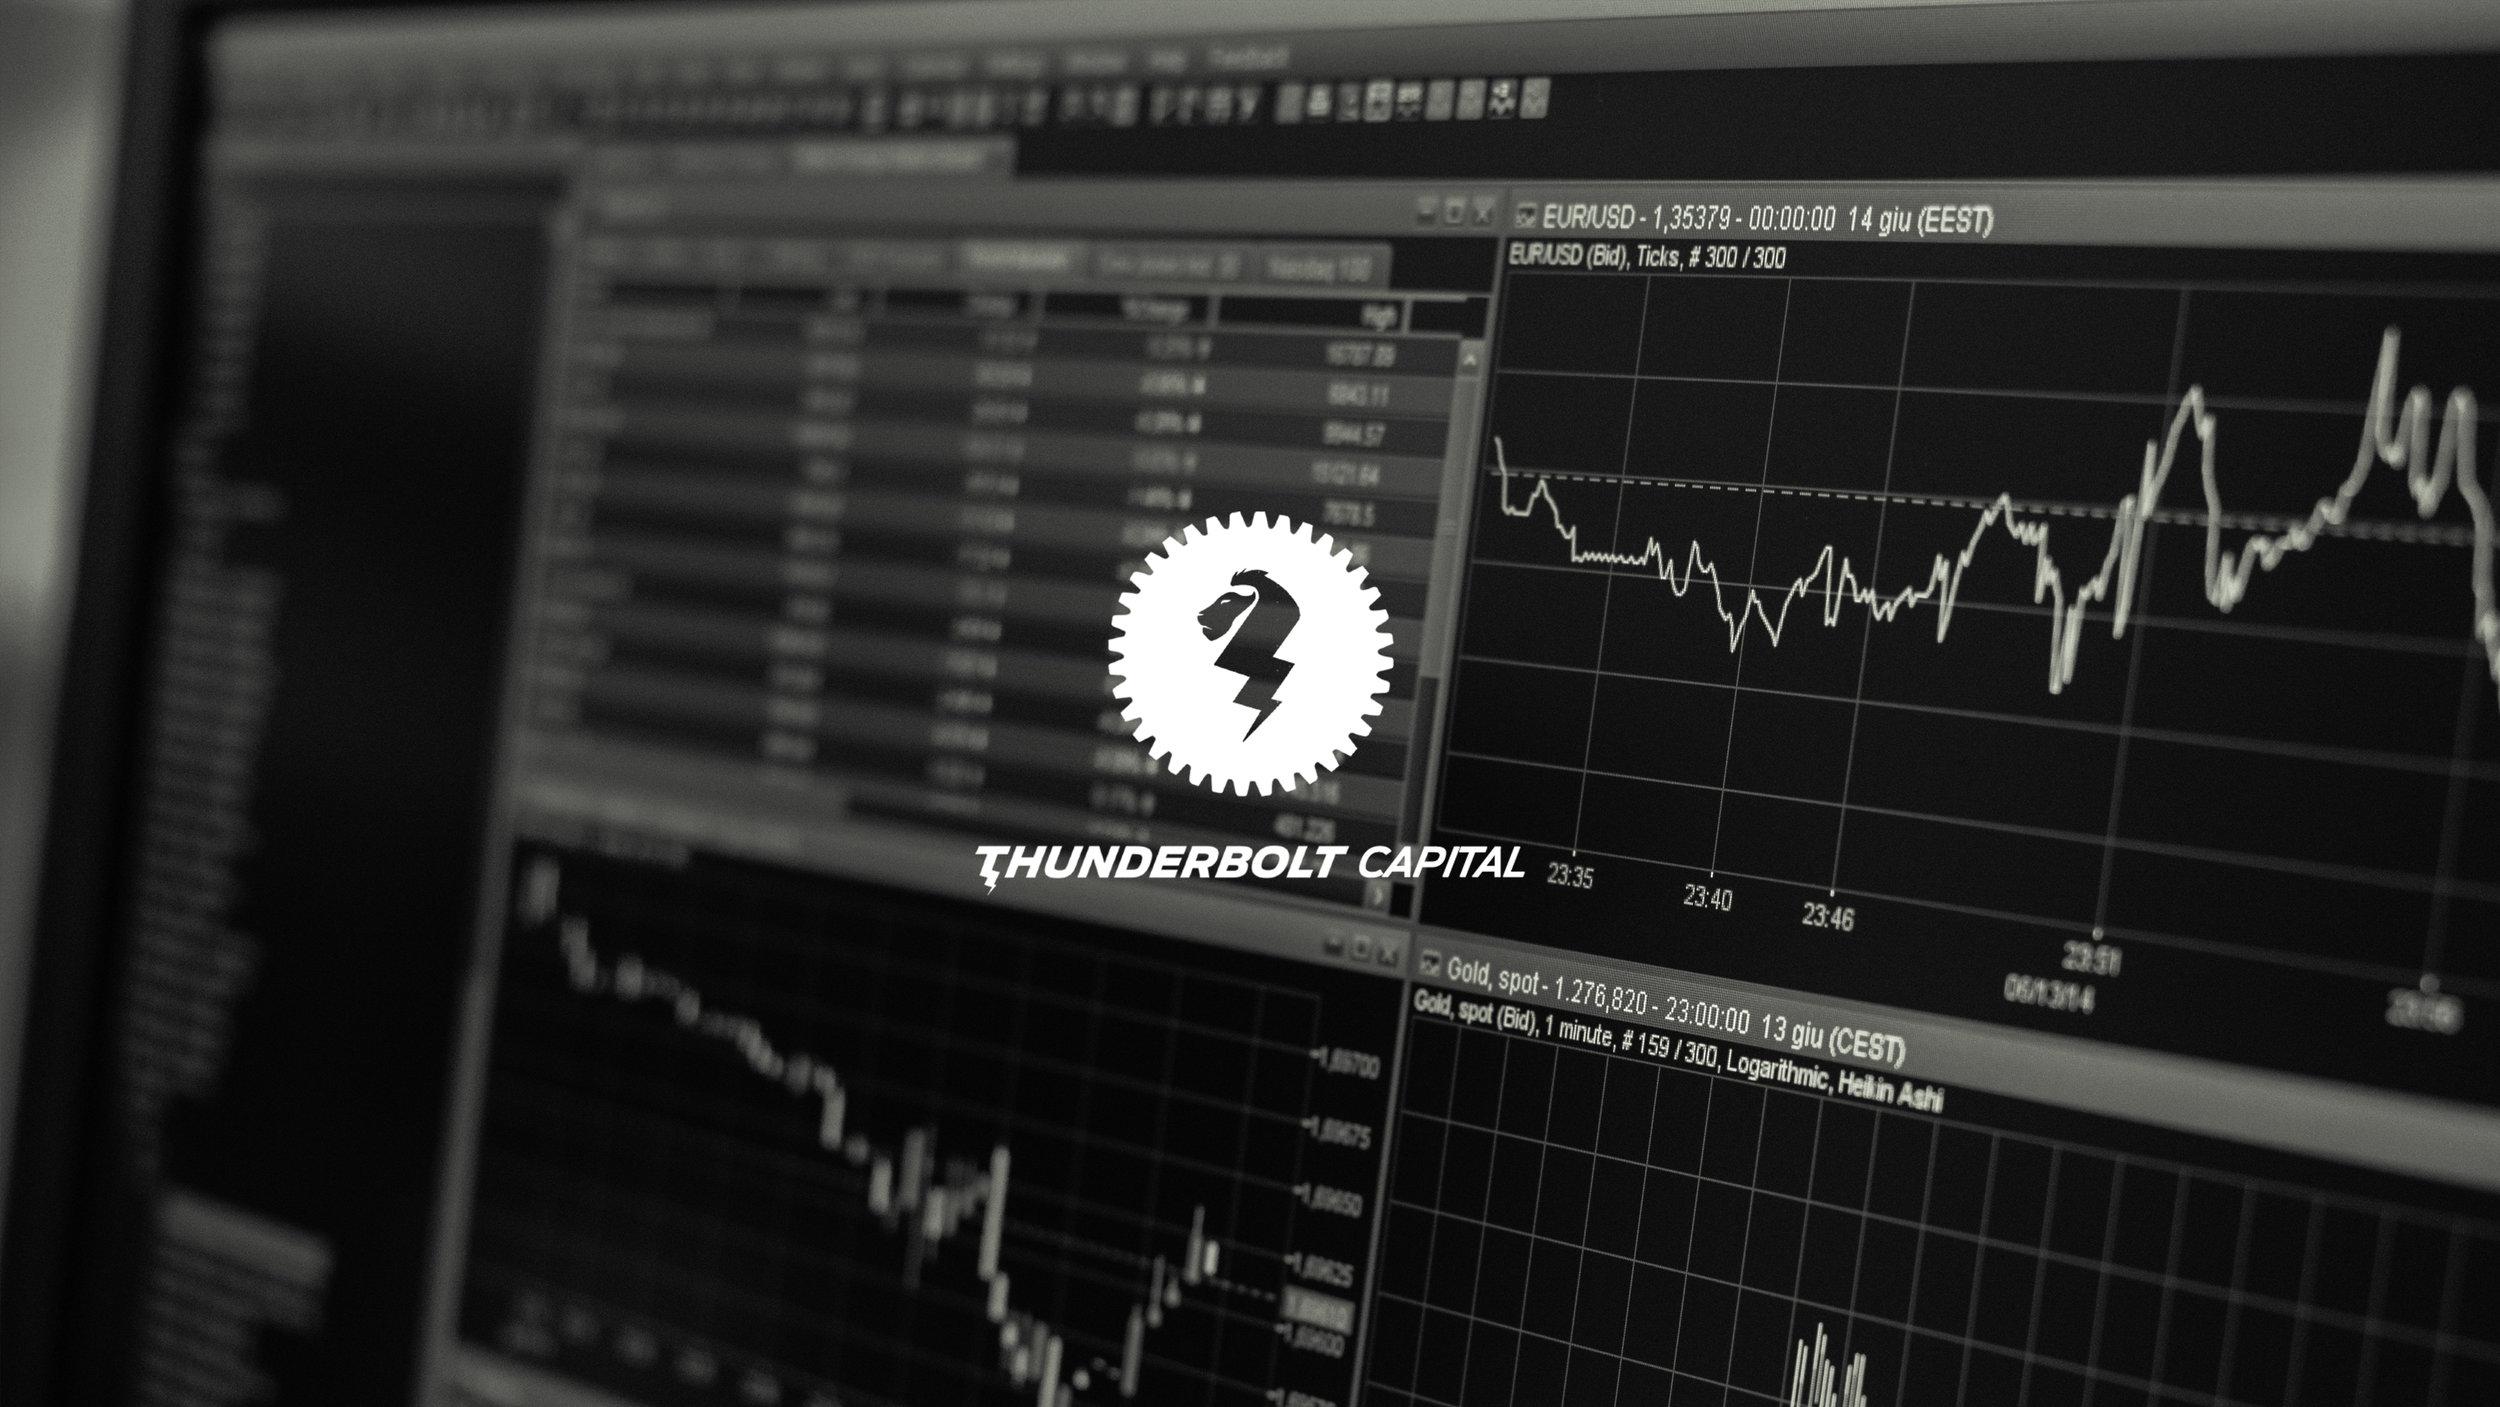 Thunderbolt Capital - Webapp design